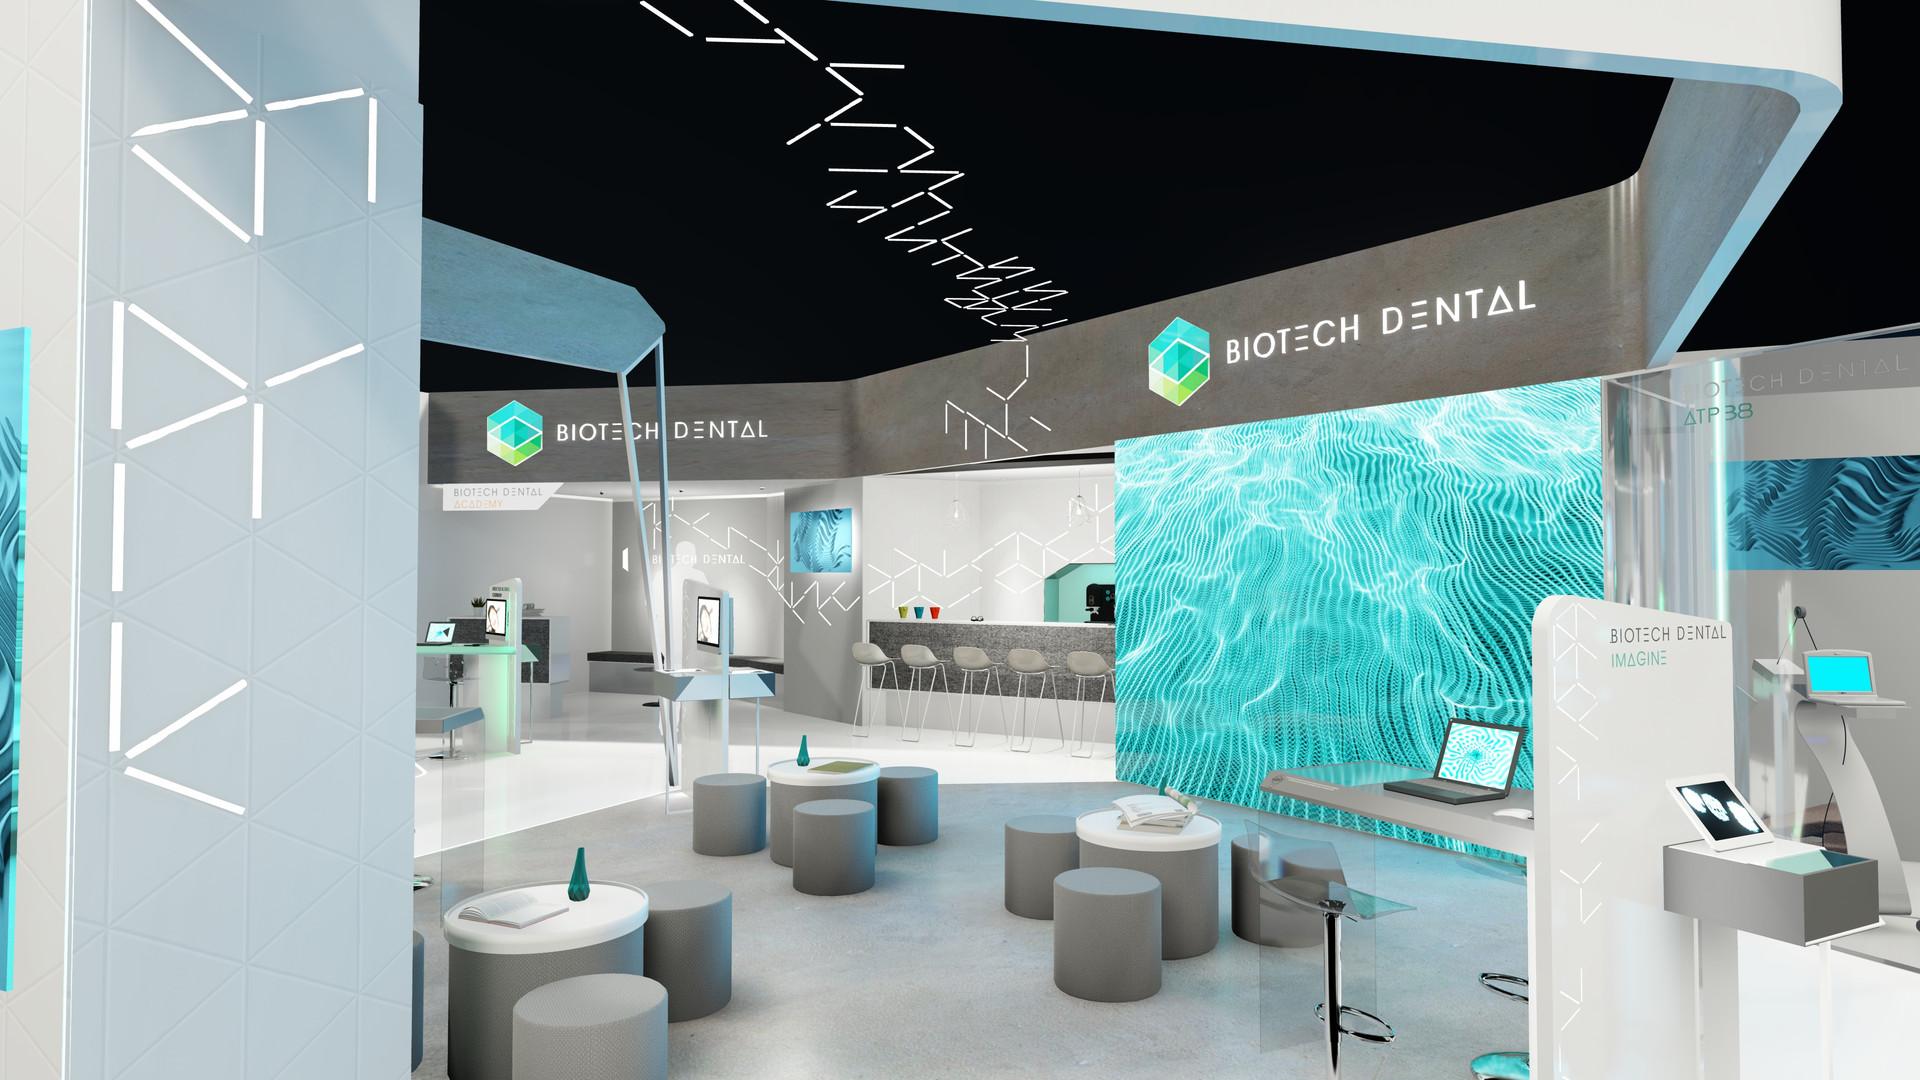 Biotech Dental © aplusb